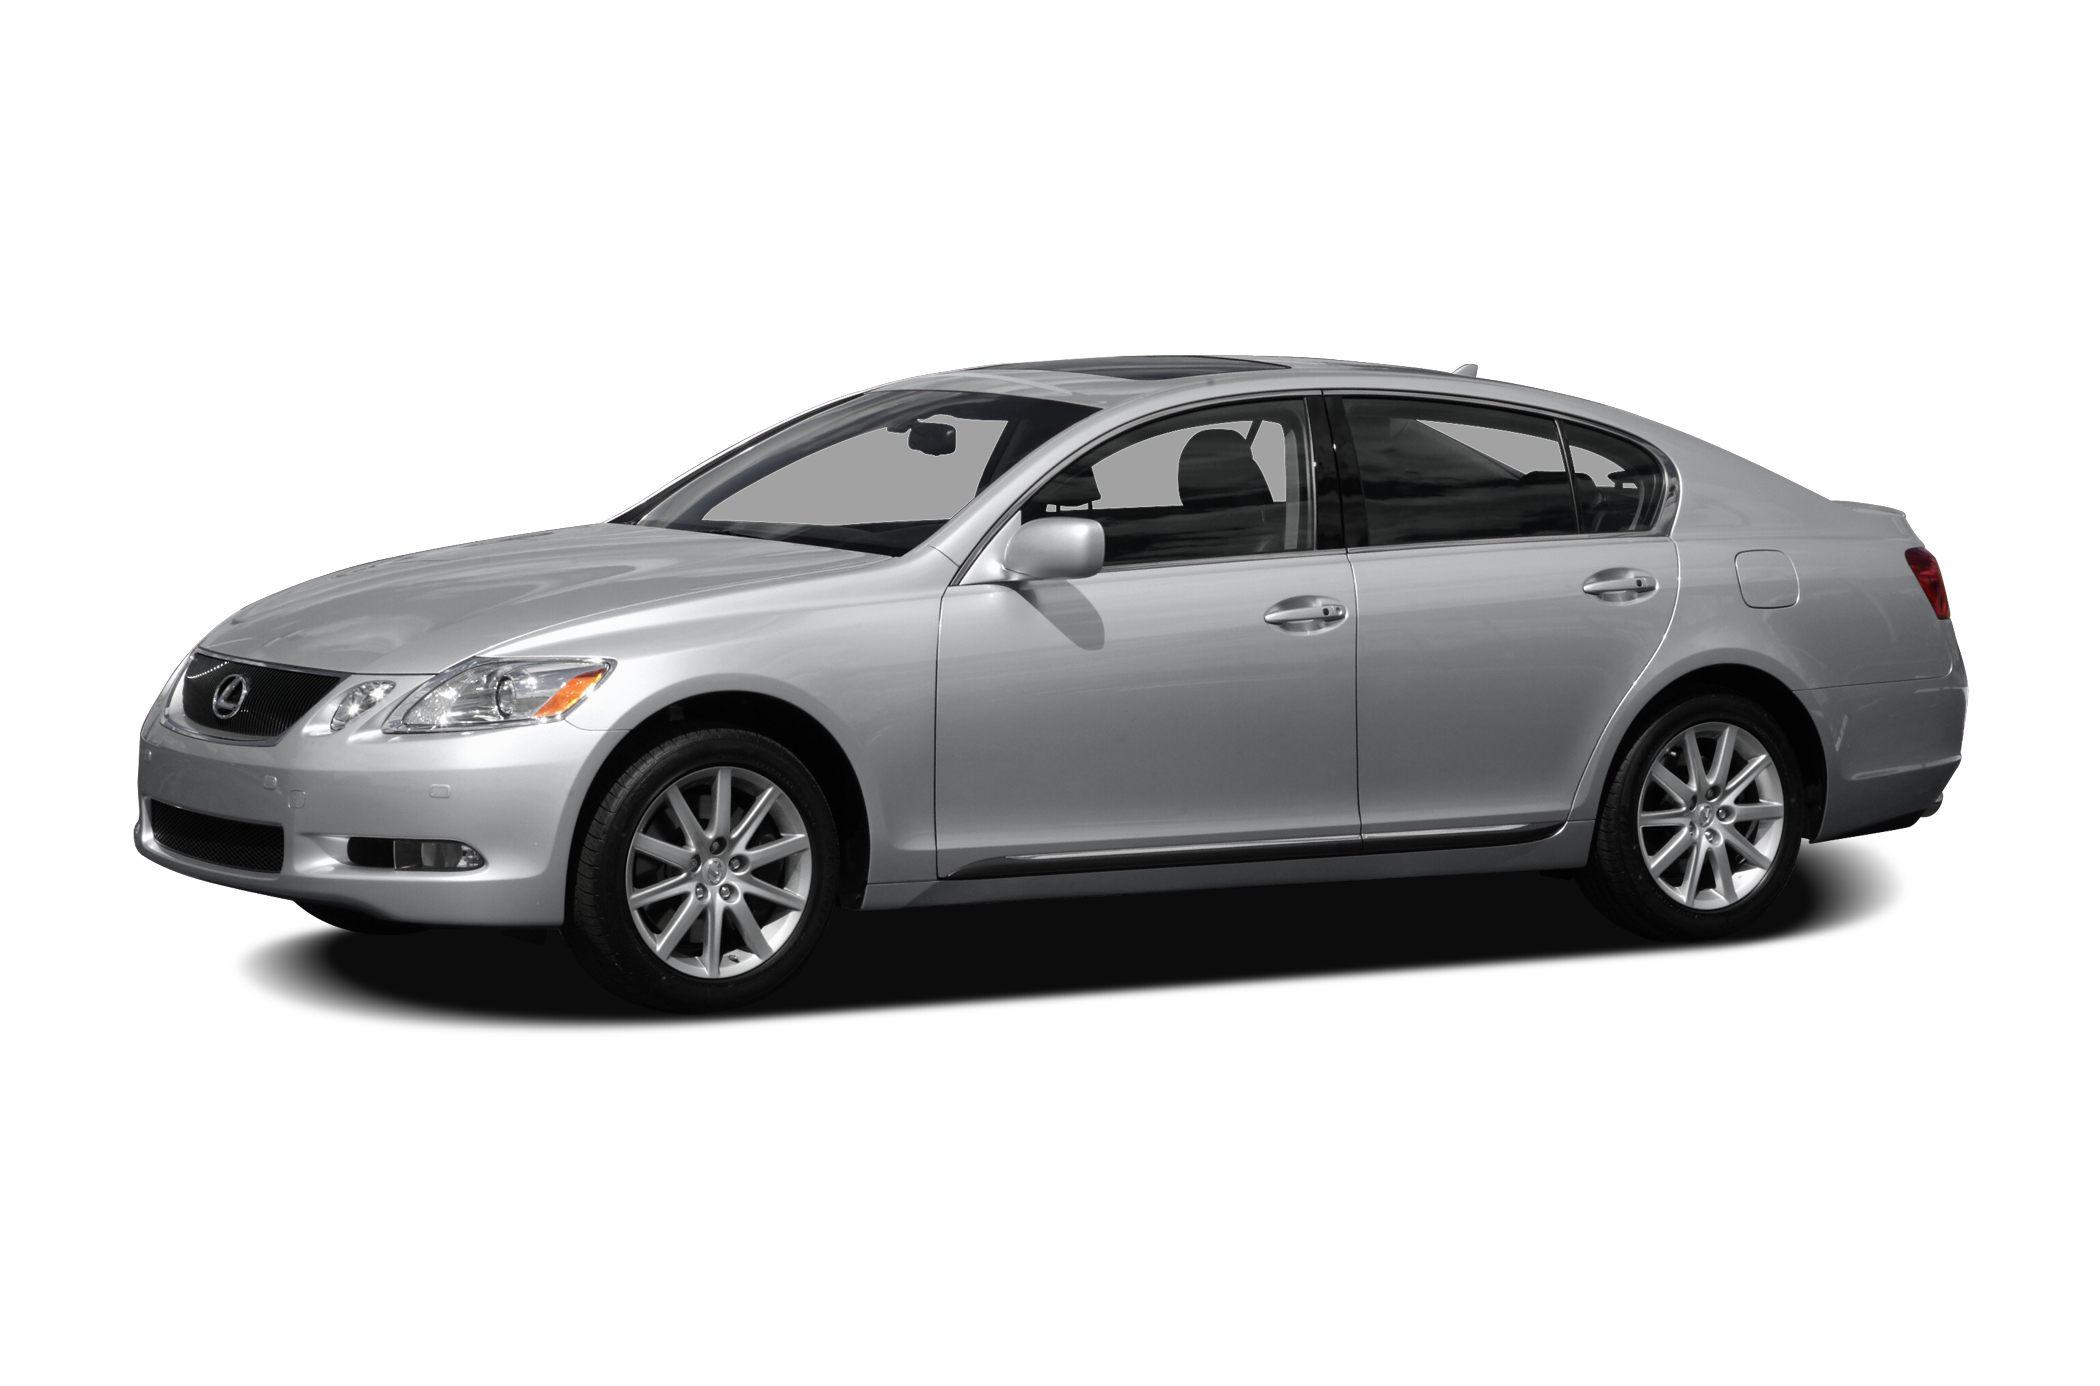 2007 Lexus GS 350 Sedan for sale in Marietta for $16,321 with 97,938 miles